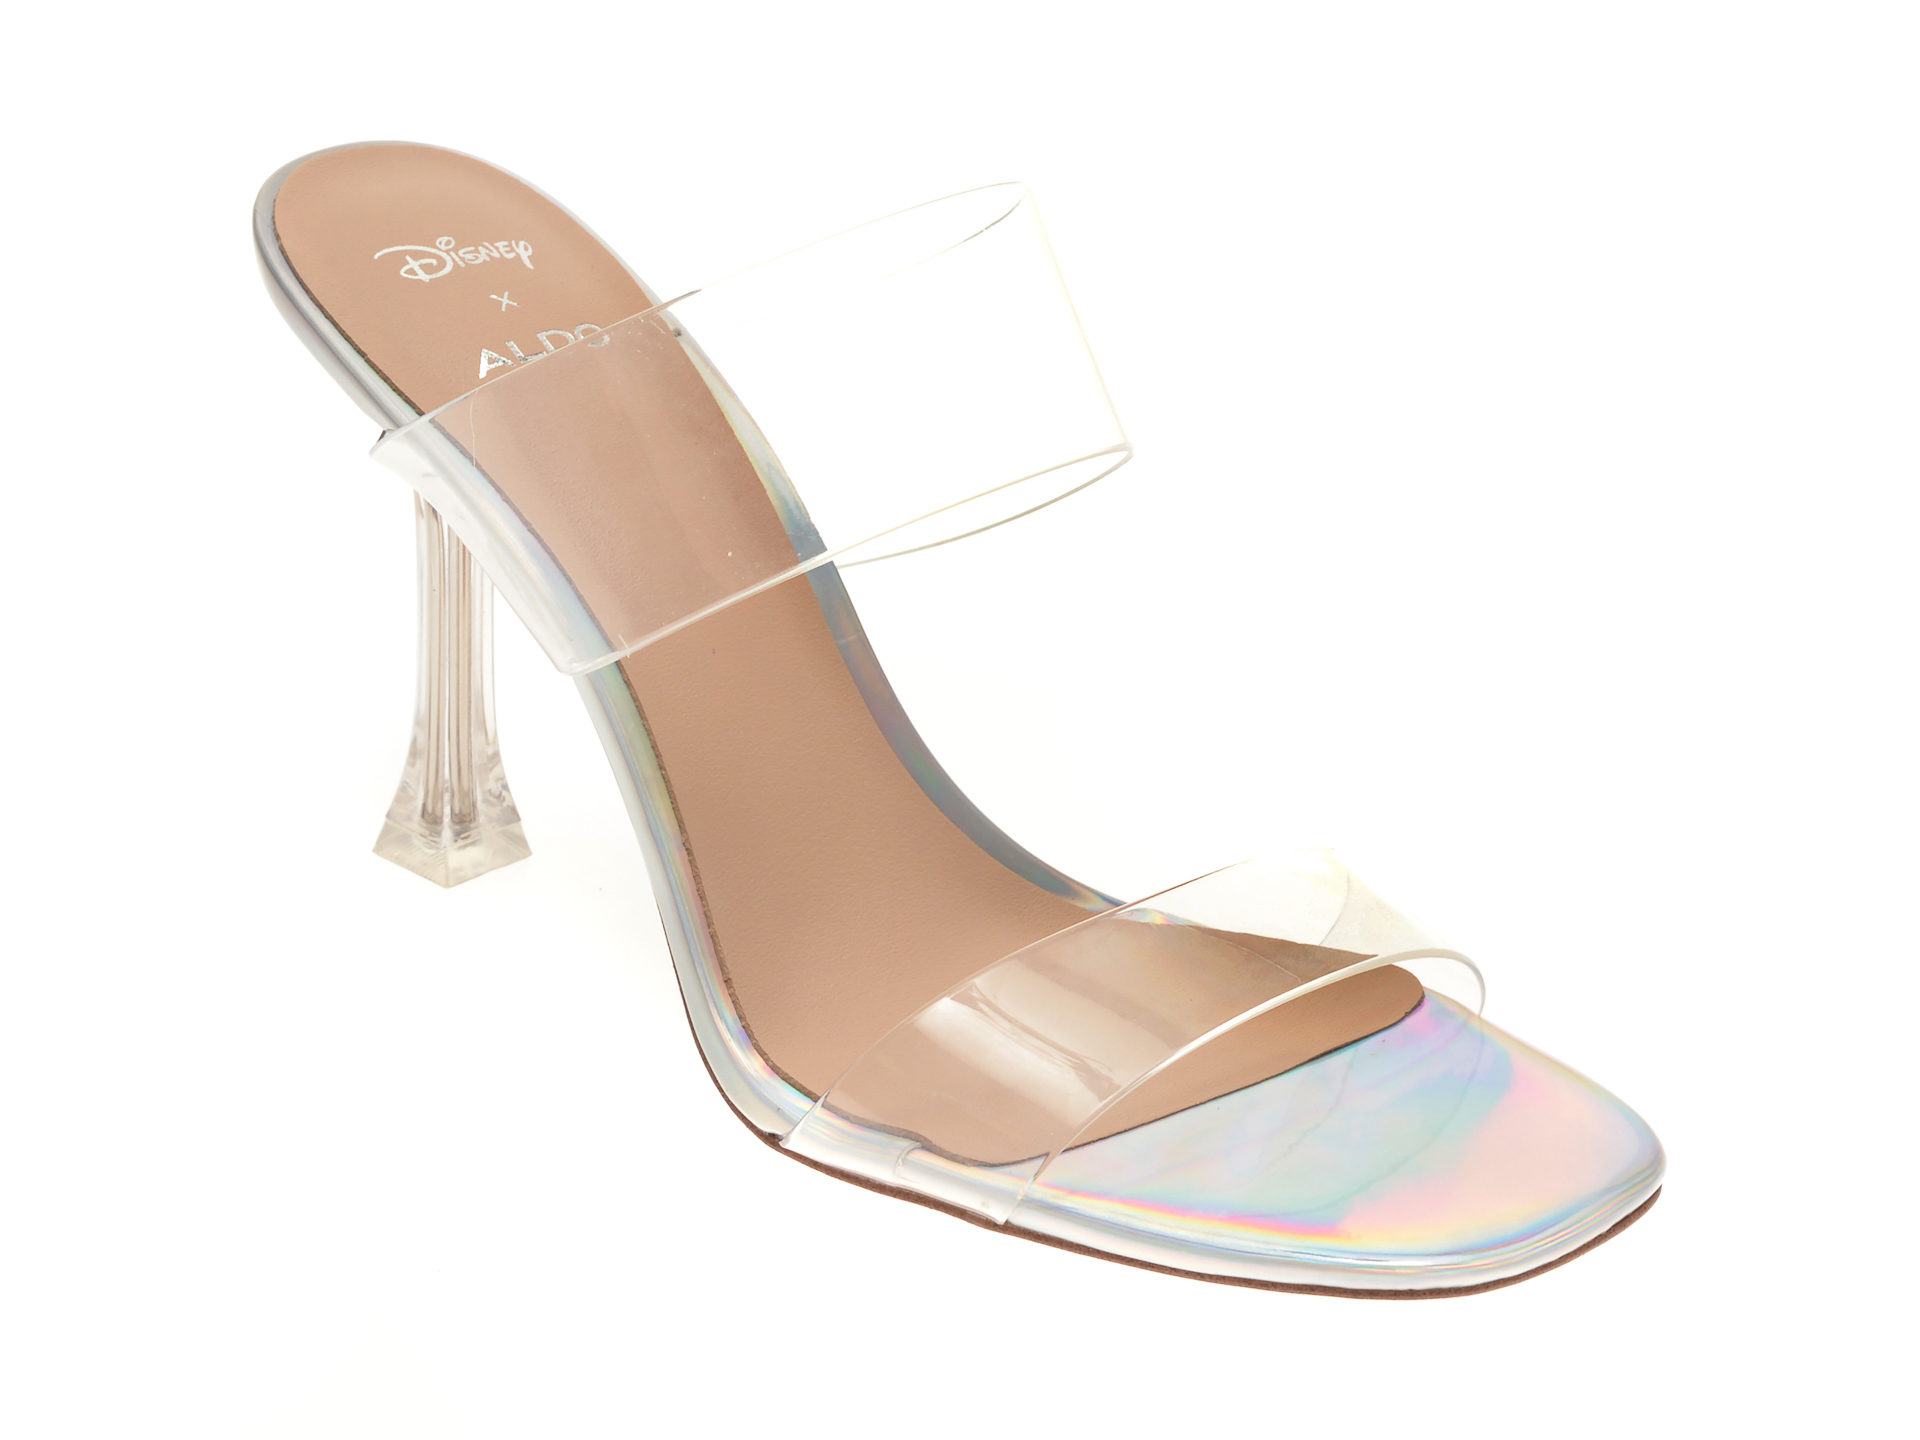 Sandale ALDO transparente, Stepsisters103, din pvc imagine otter.ro 2021